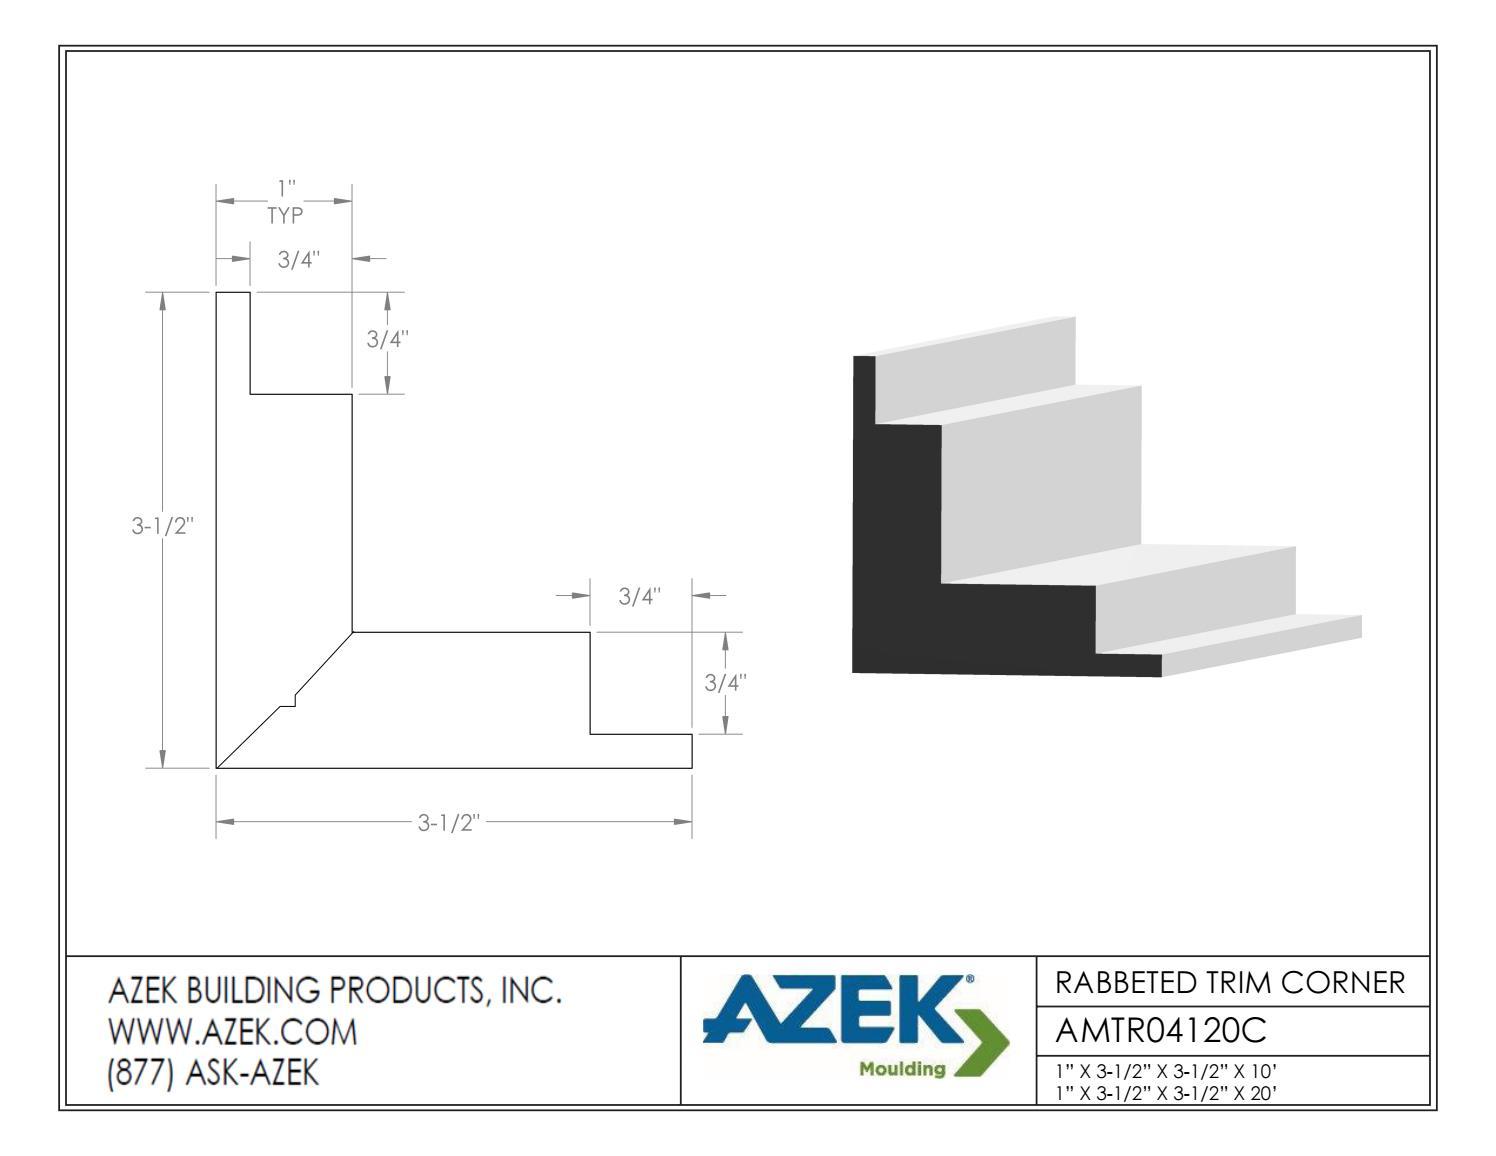 Azek Moulding 4 in Rabbeted Cornerboard Specifications by